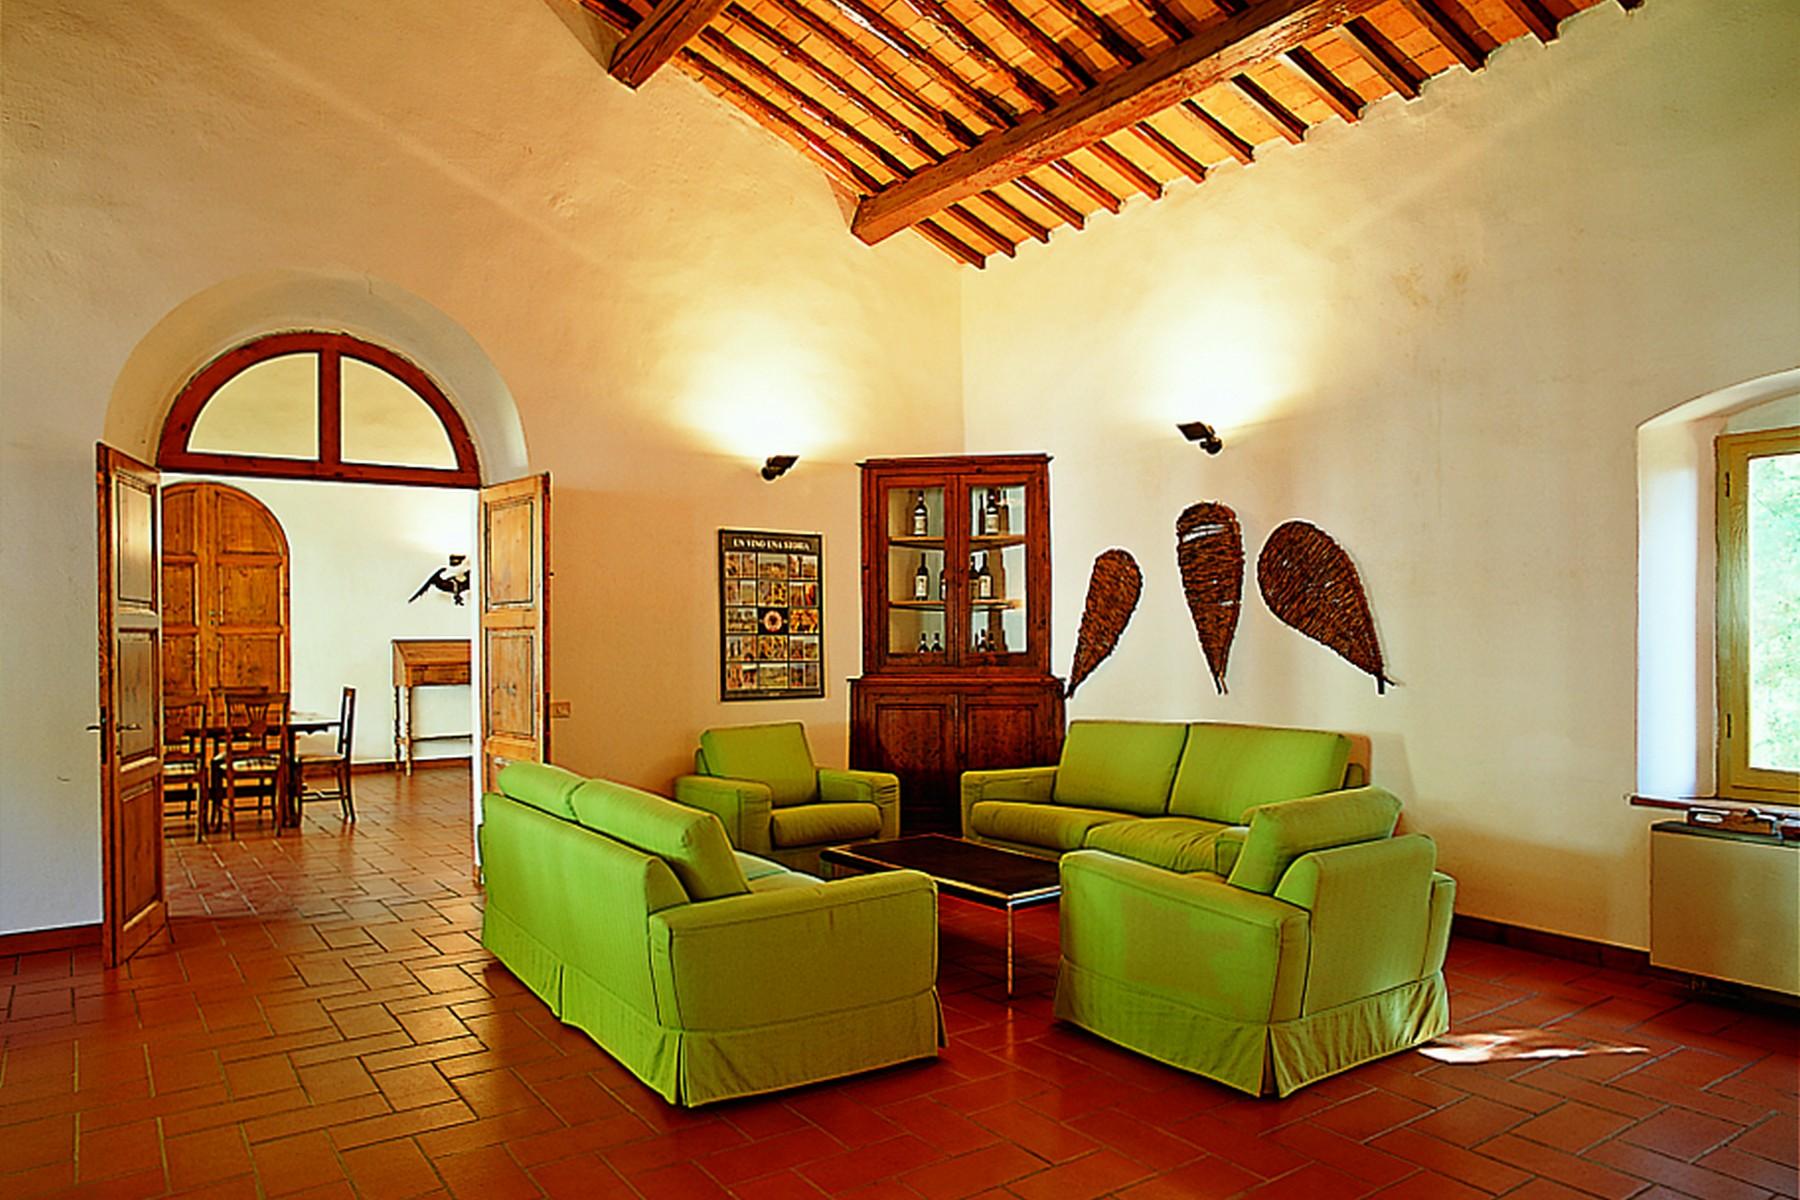 Villa in Vendita a Gaiole In Chianti: 5 locali, 4285 mq - Foto 8